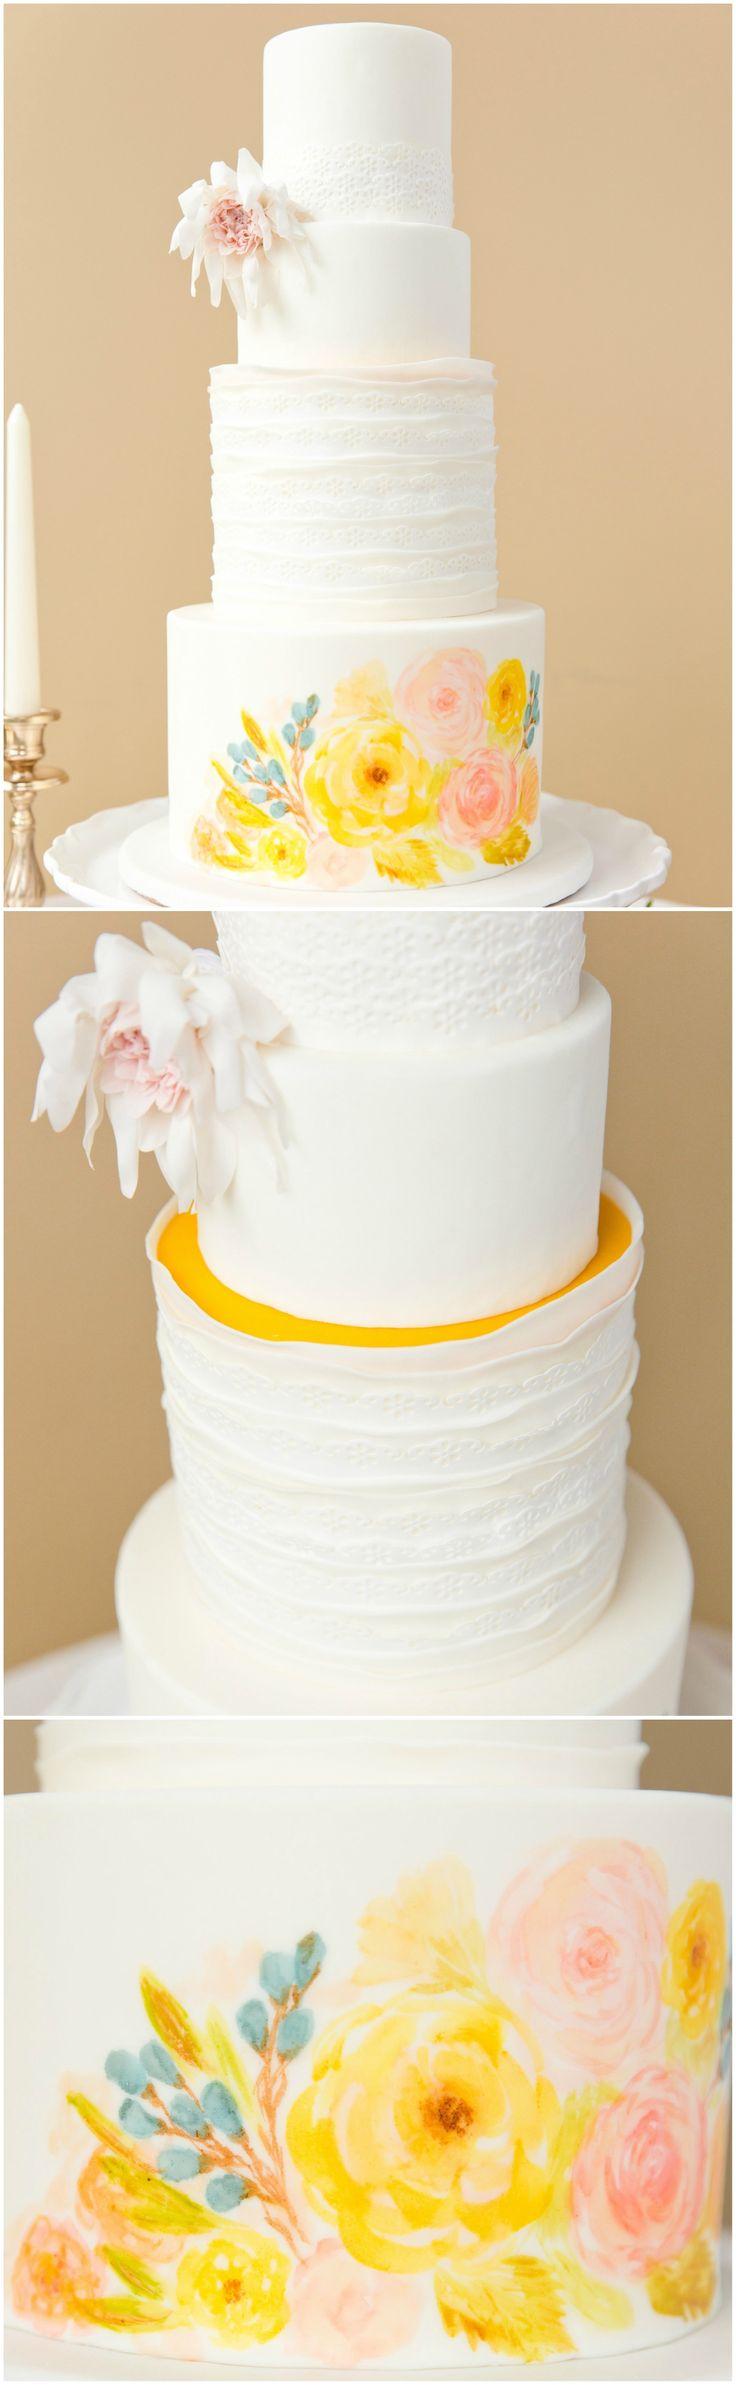 Tall wedding cake, painted flowers, hidden orange fondant layer, cafe au last dahlia // Erica and Jon Photography